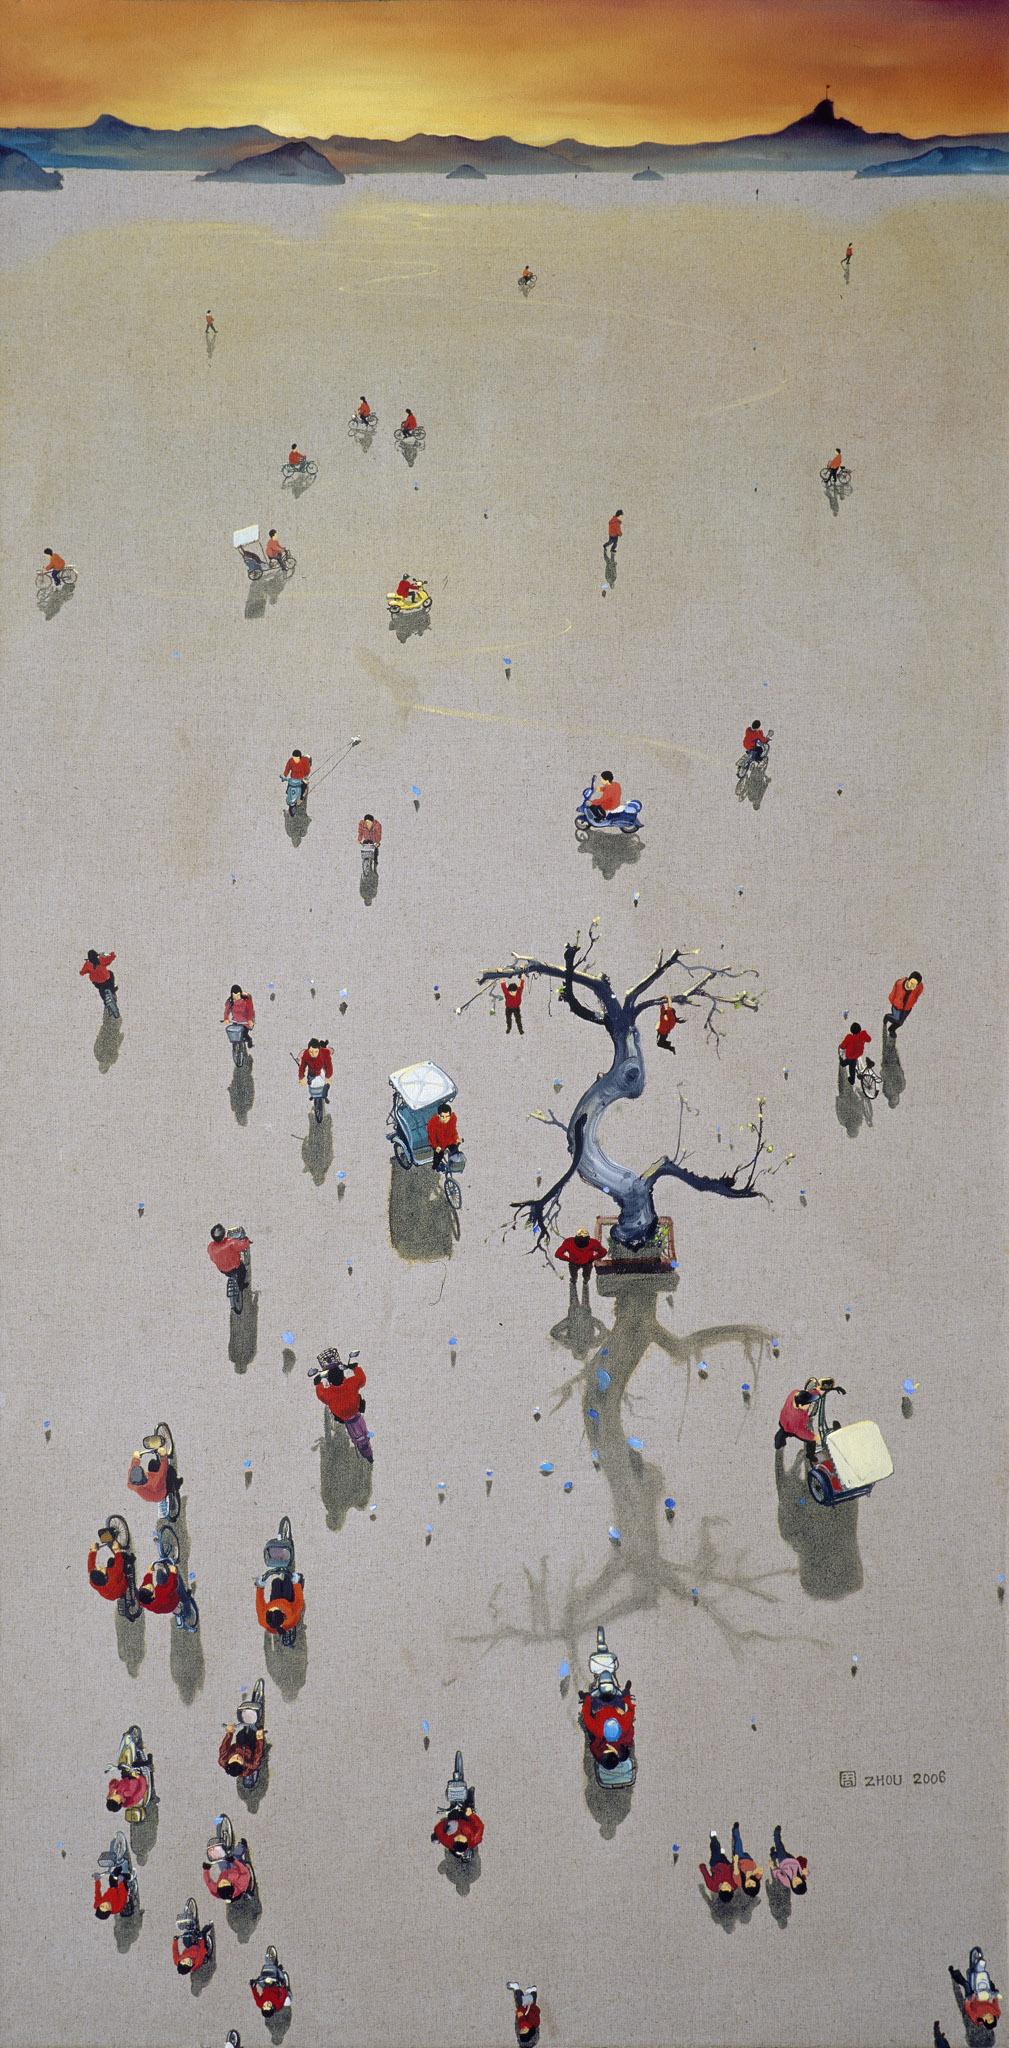 Zhou Jinhua 周金华, In the Evening No.8 人在黄昏 No.8, 2006, Oil on canvas 布面油画, 150 x 75 cm